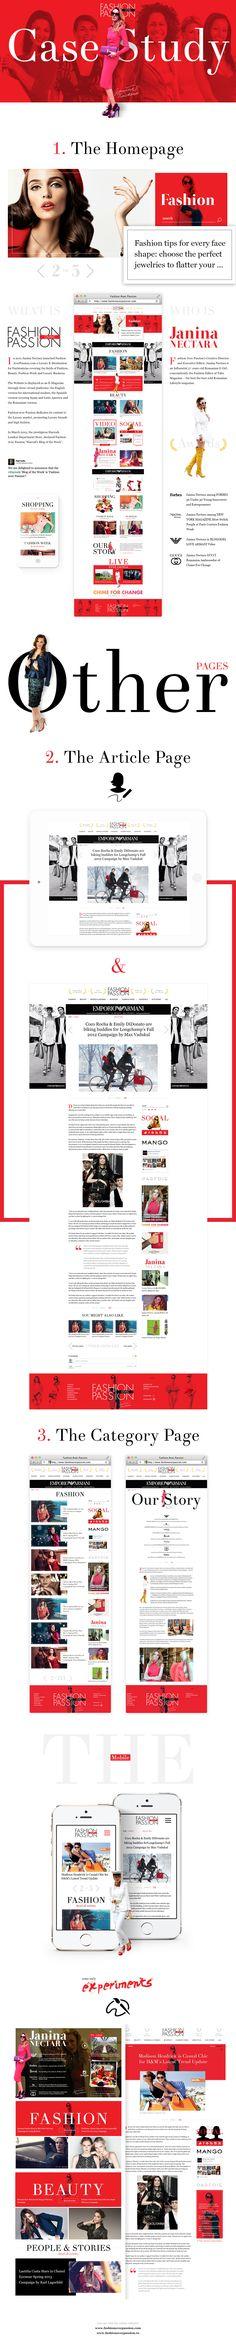 Fashion Avec Passion Case Study by Cosmin Neagu